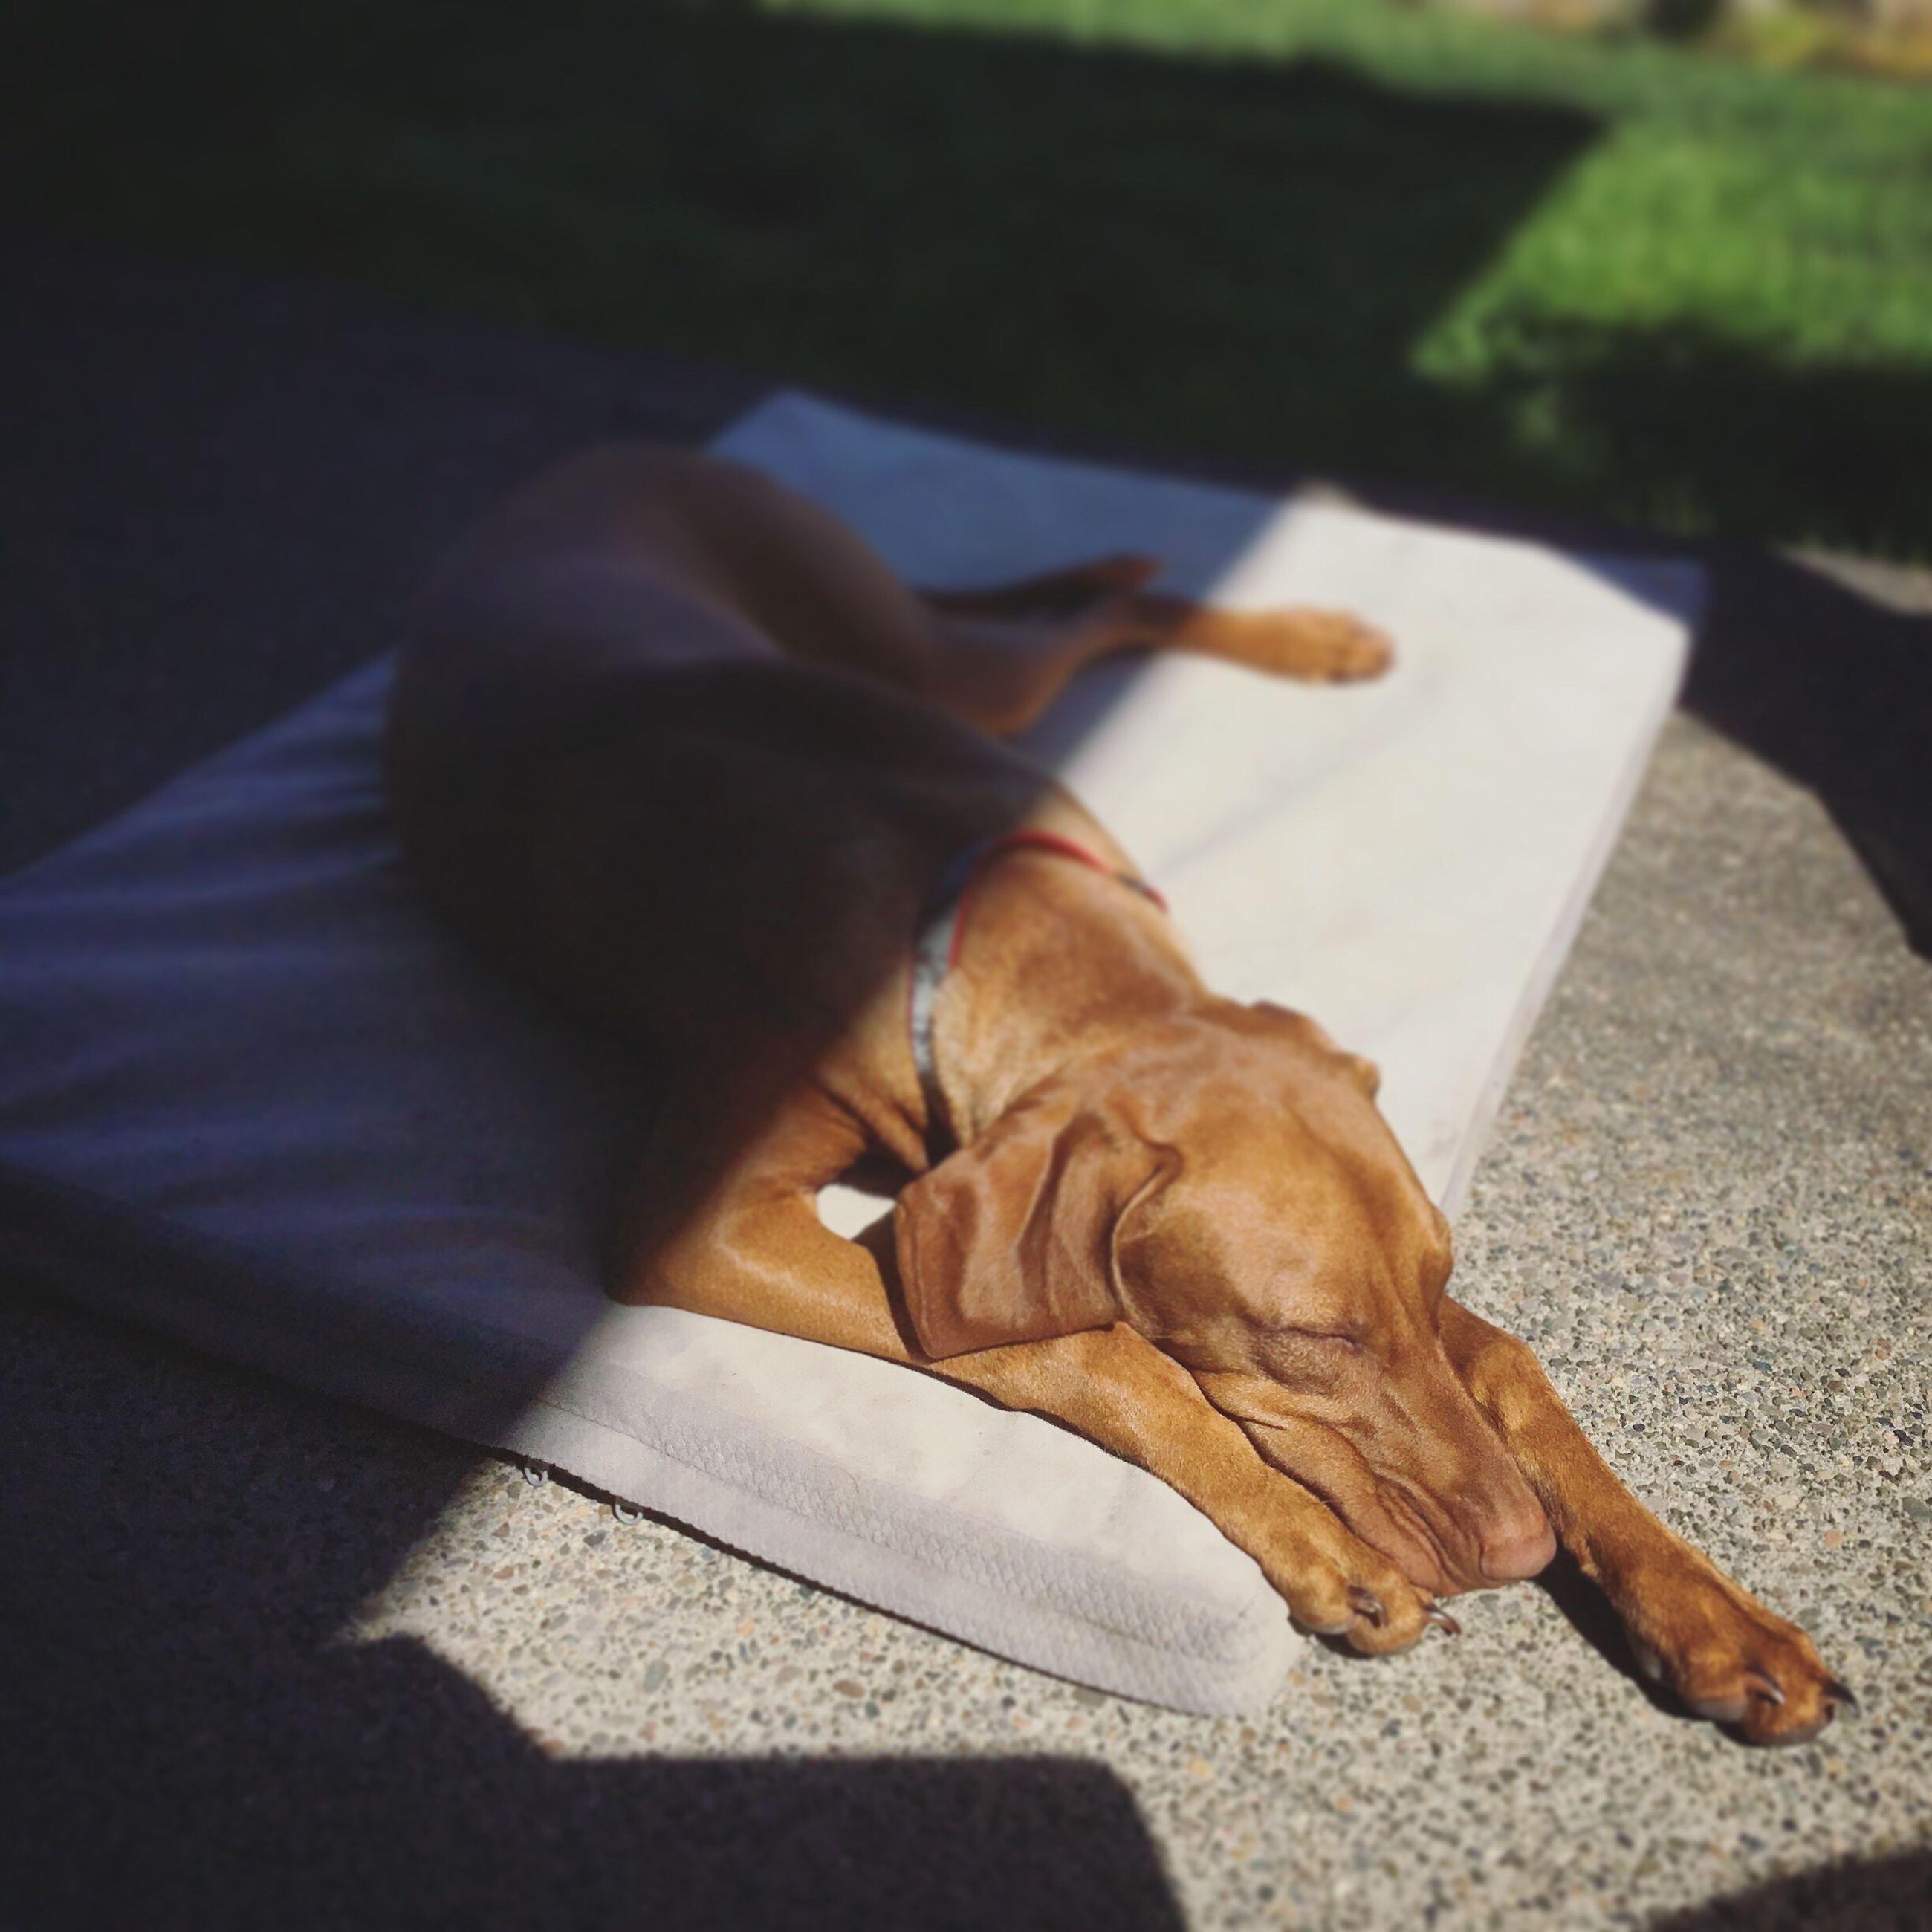 High angle view of dog sleeping outdoors